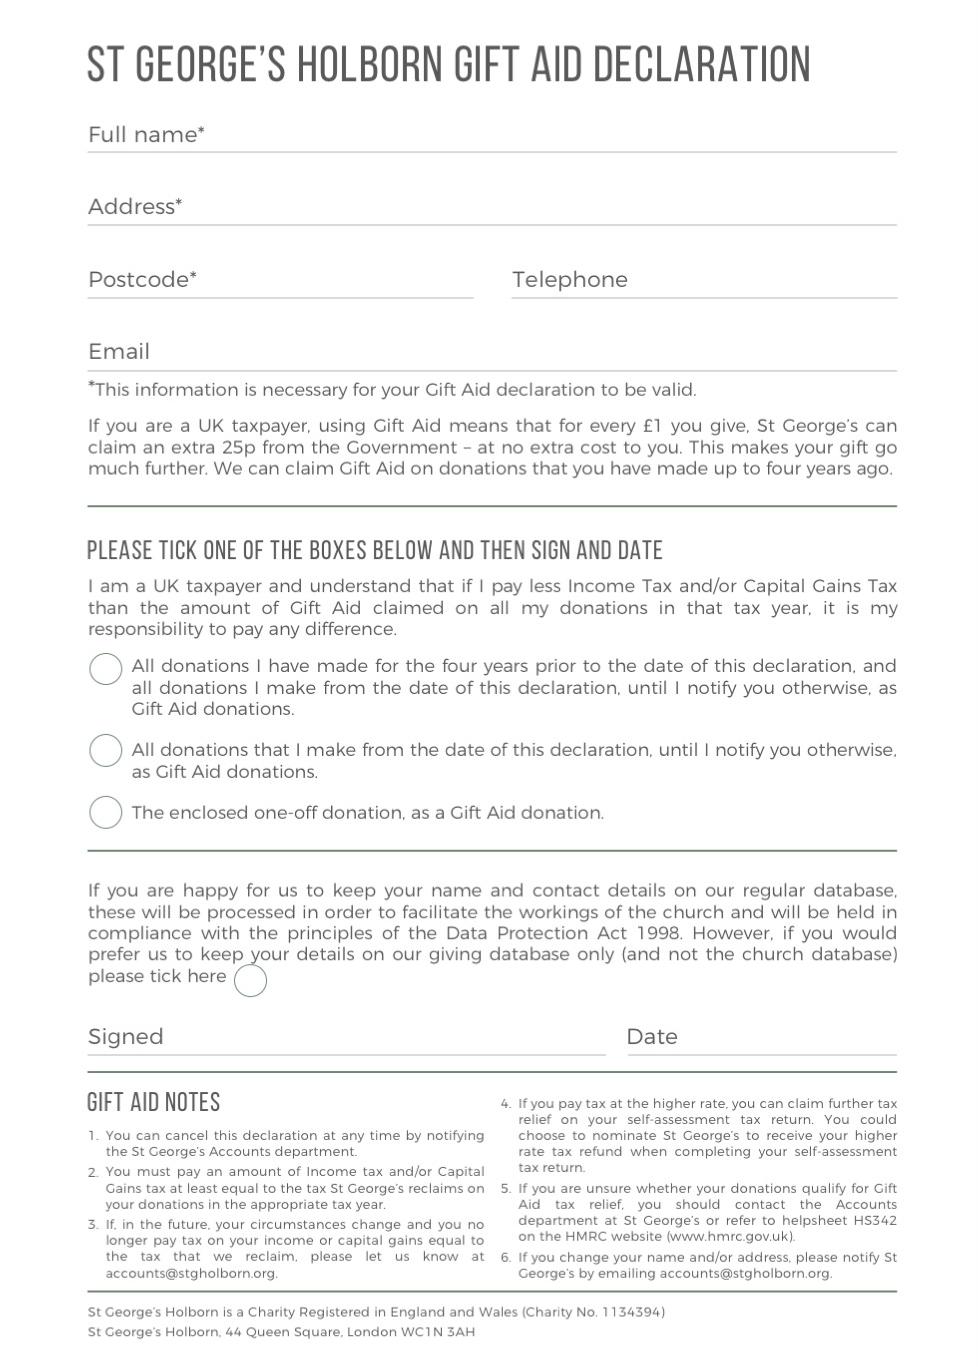 Gift aid form.jpg